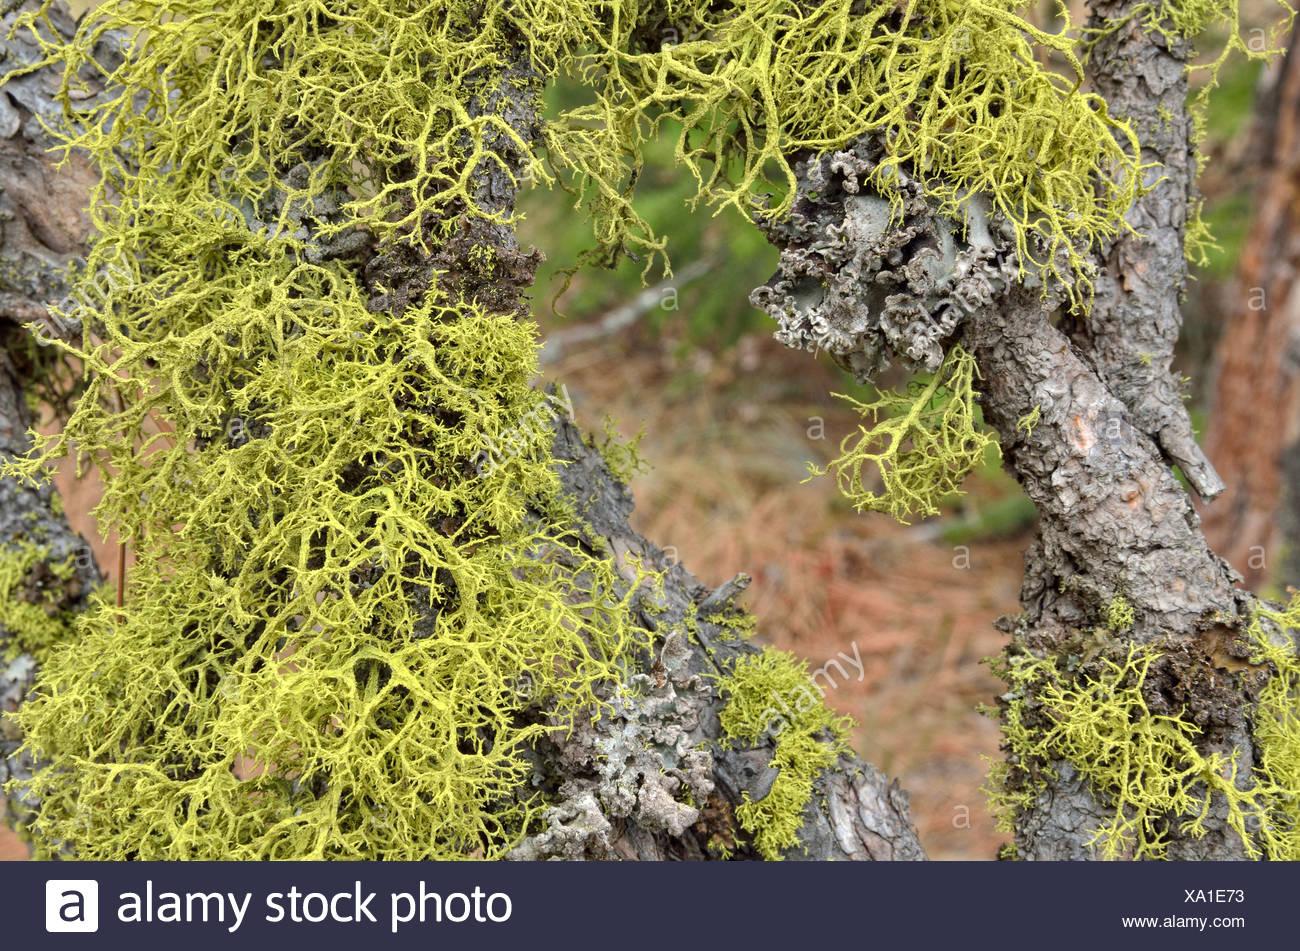 Lichen species (Usnea), Coeur d'Alene, Idaho, USA - Stock Image